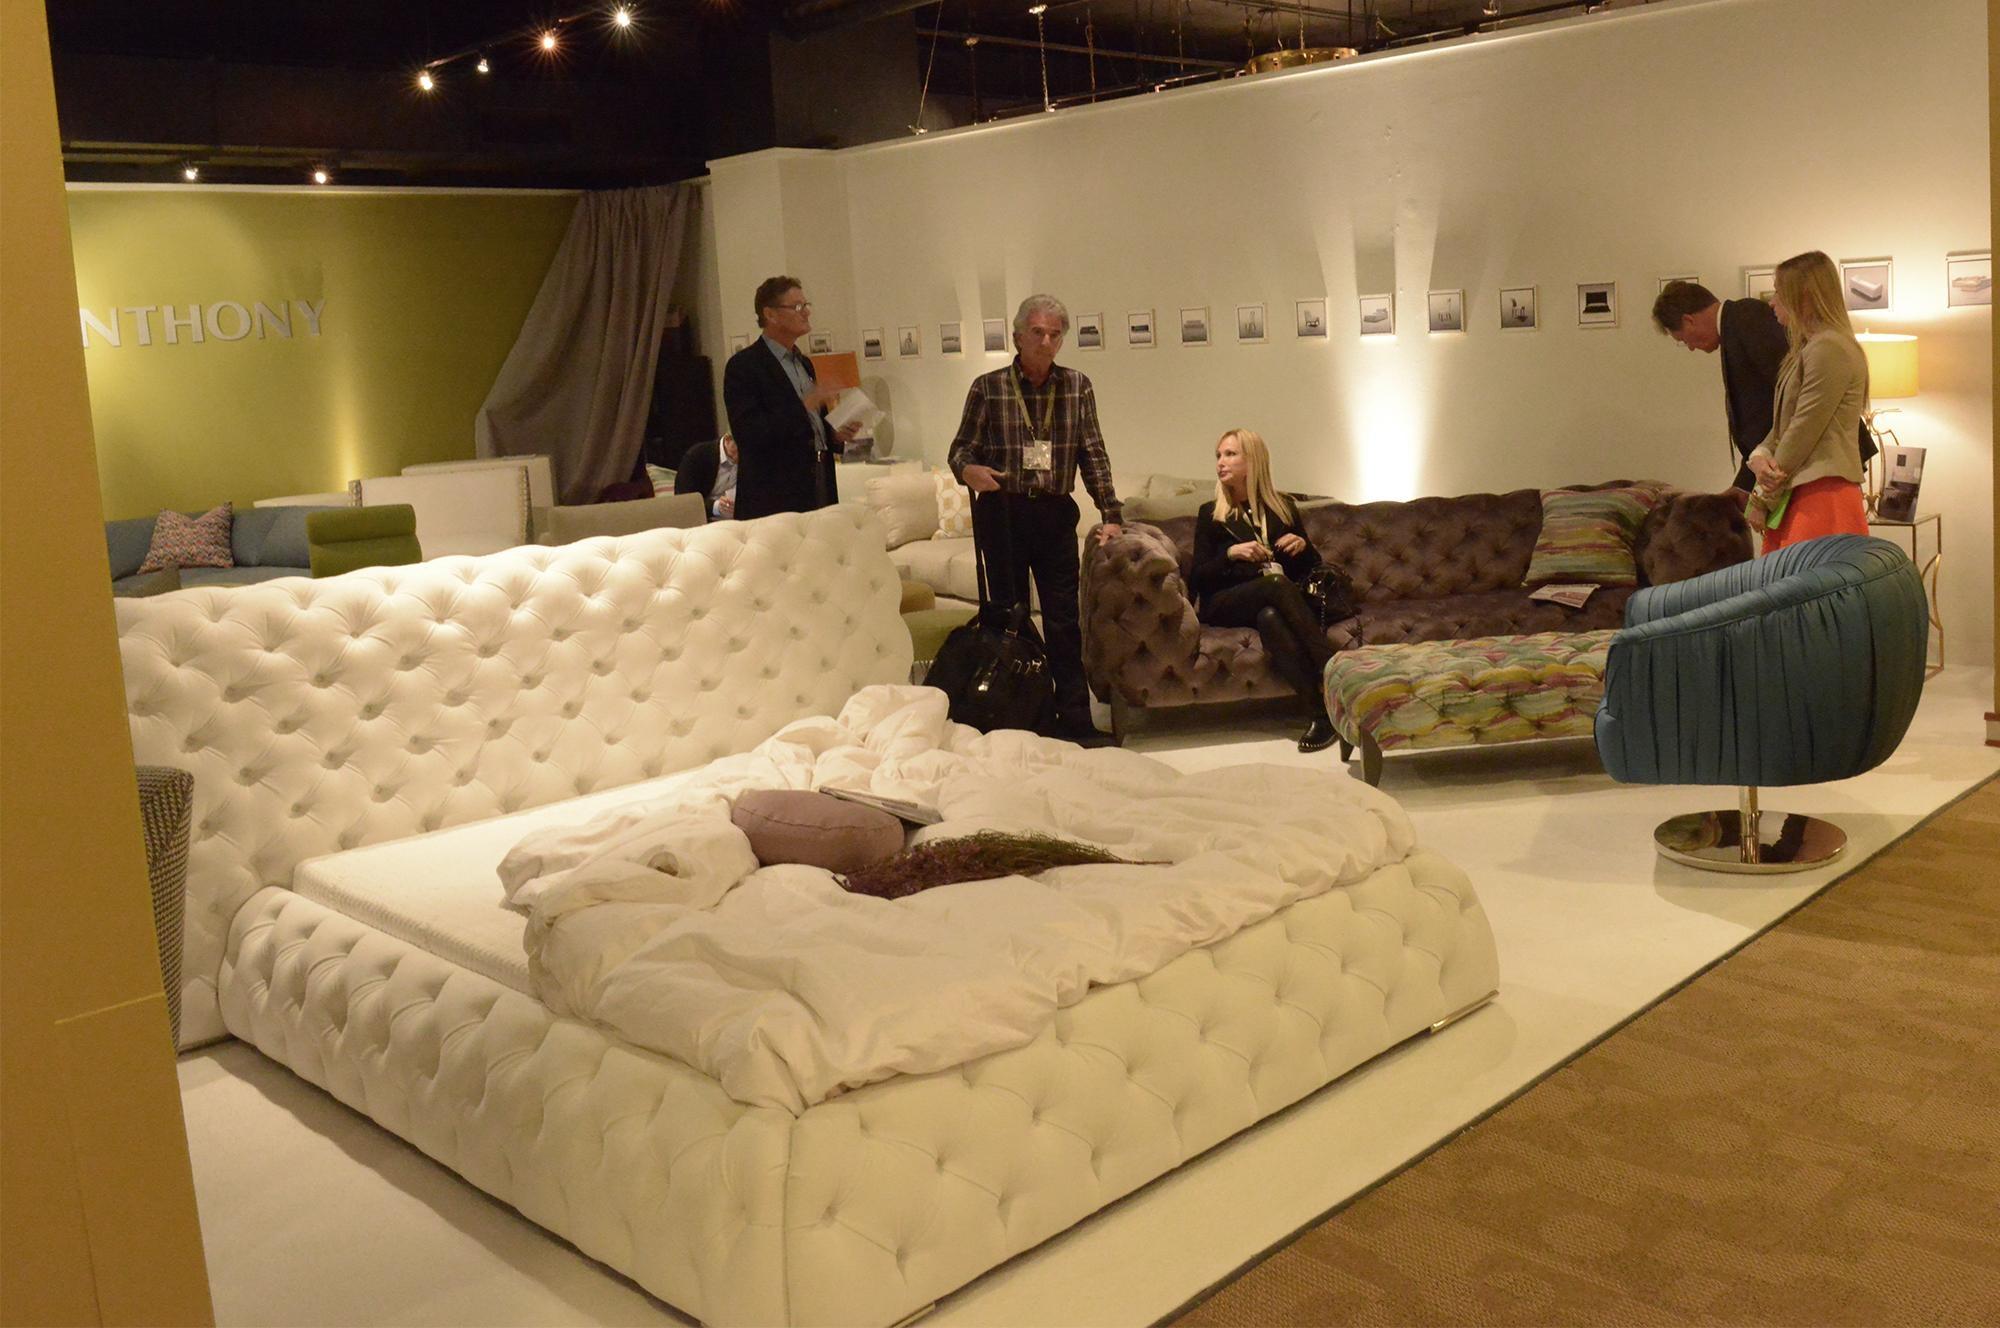 Cantoni Sofa Modern Sofas And Loveseats Cantoni – Thesofa Within Cantoni Sofas (View 5 of 20)